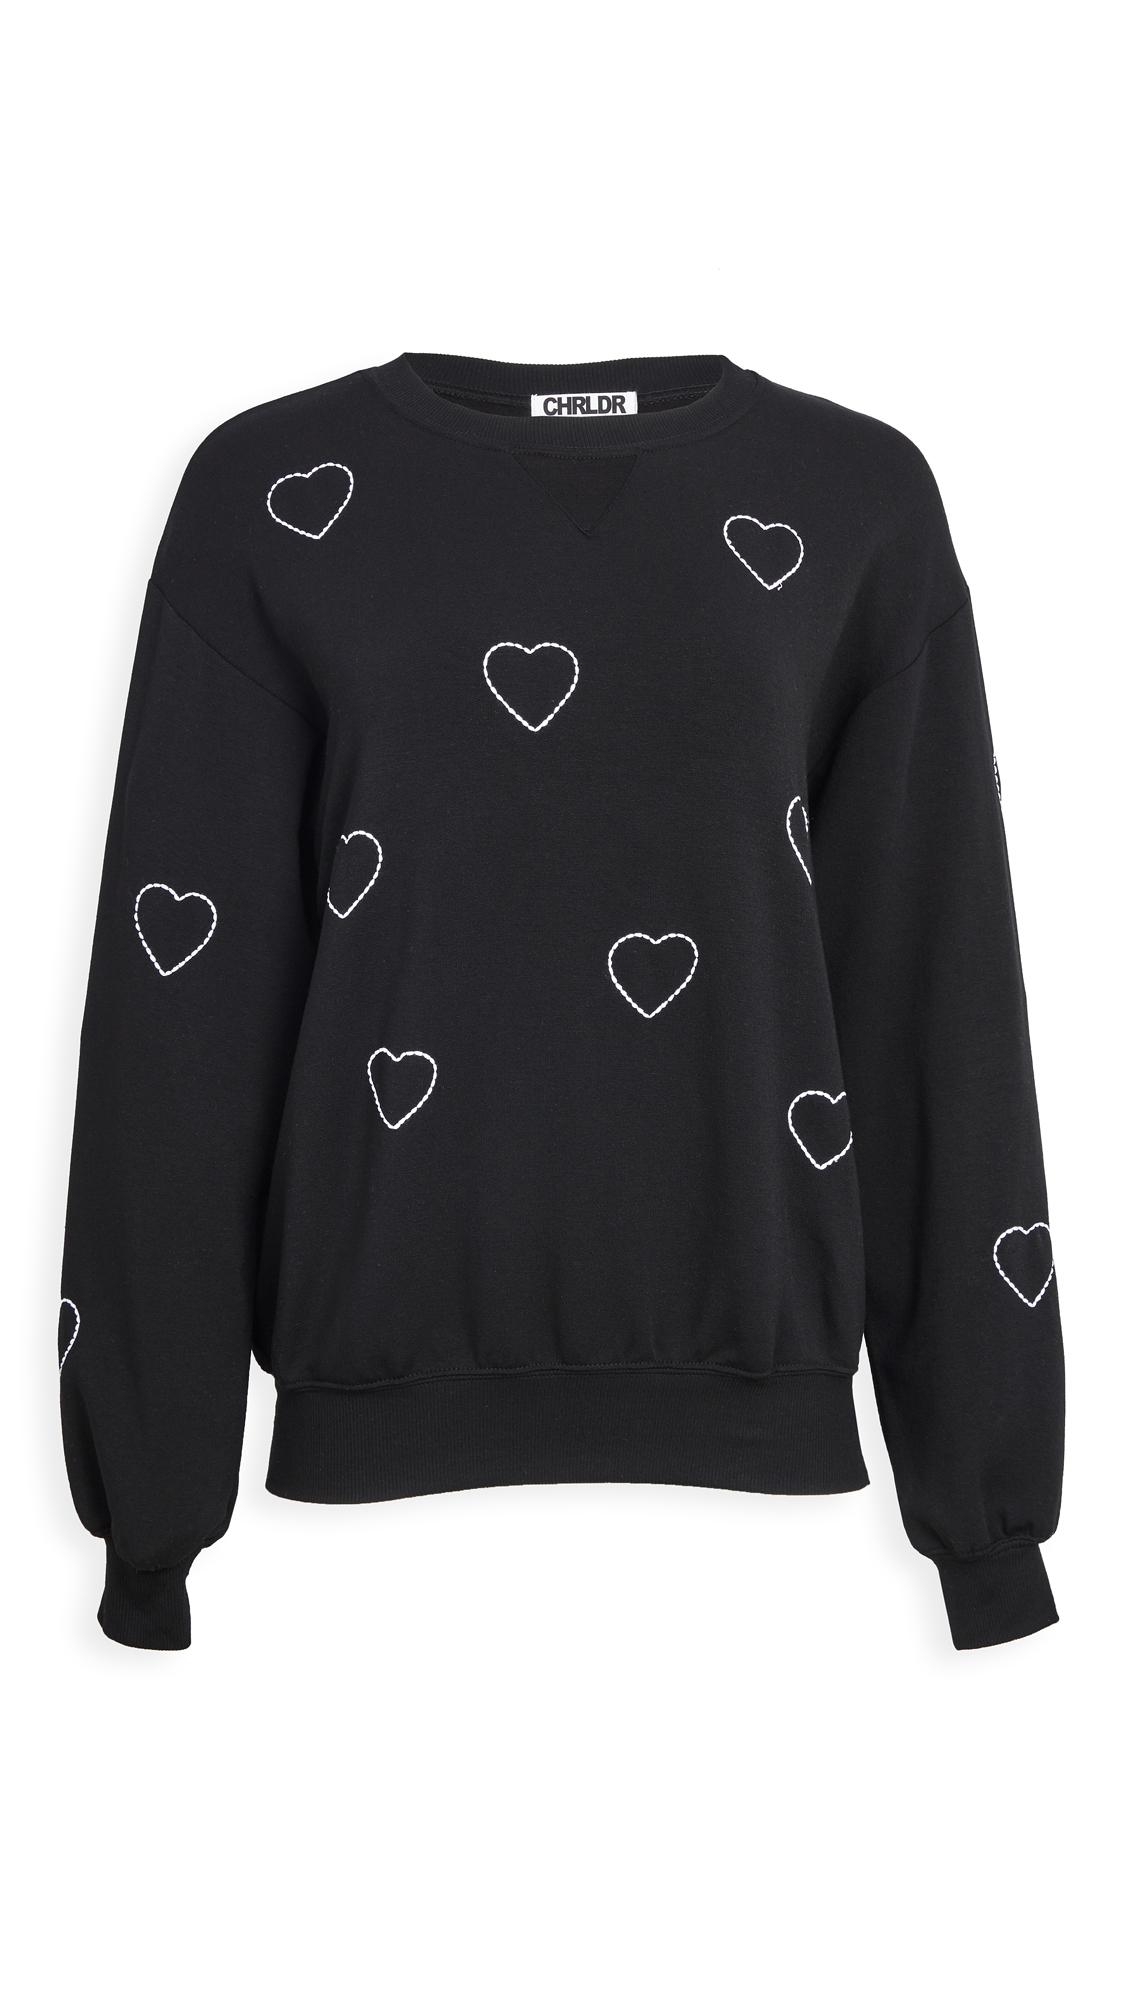 CHRLDR Stitched Heart Sweatshirt